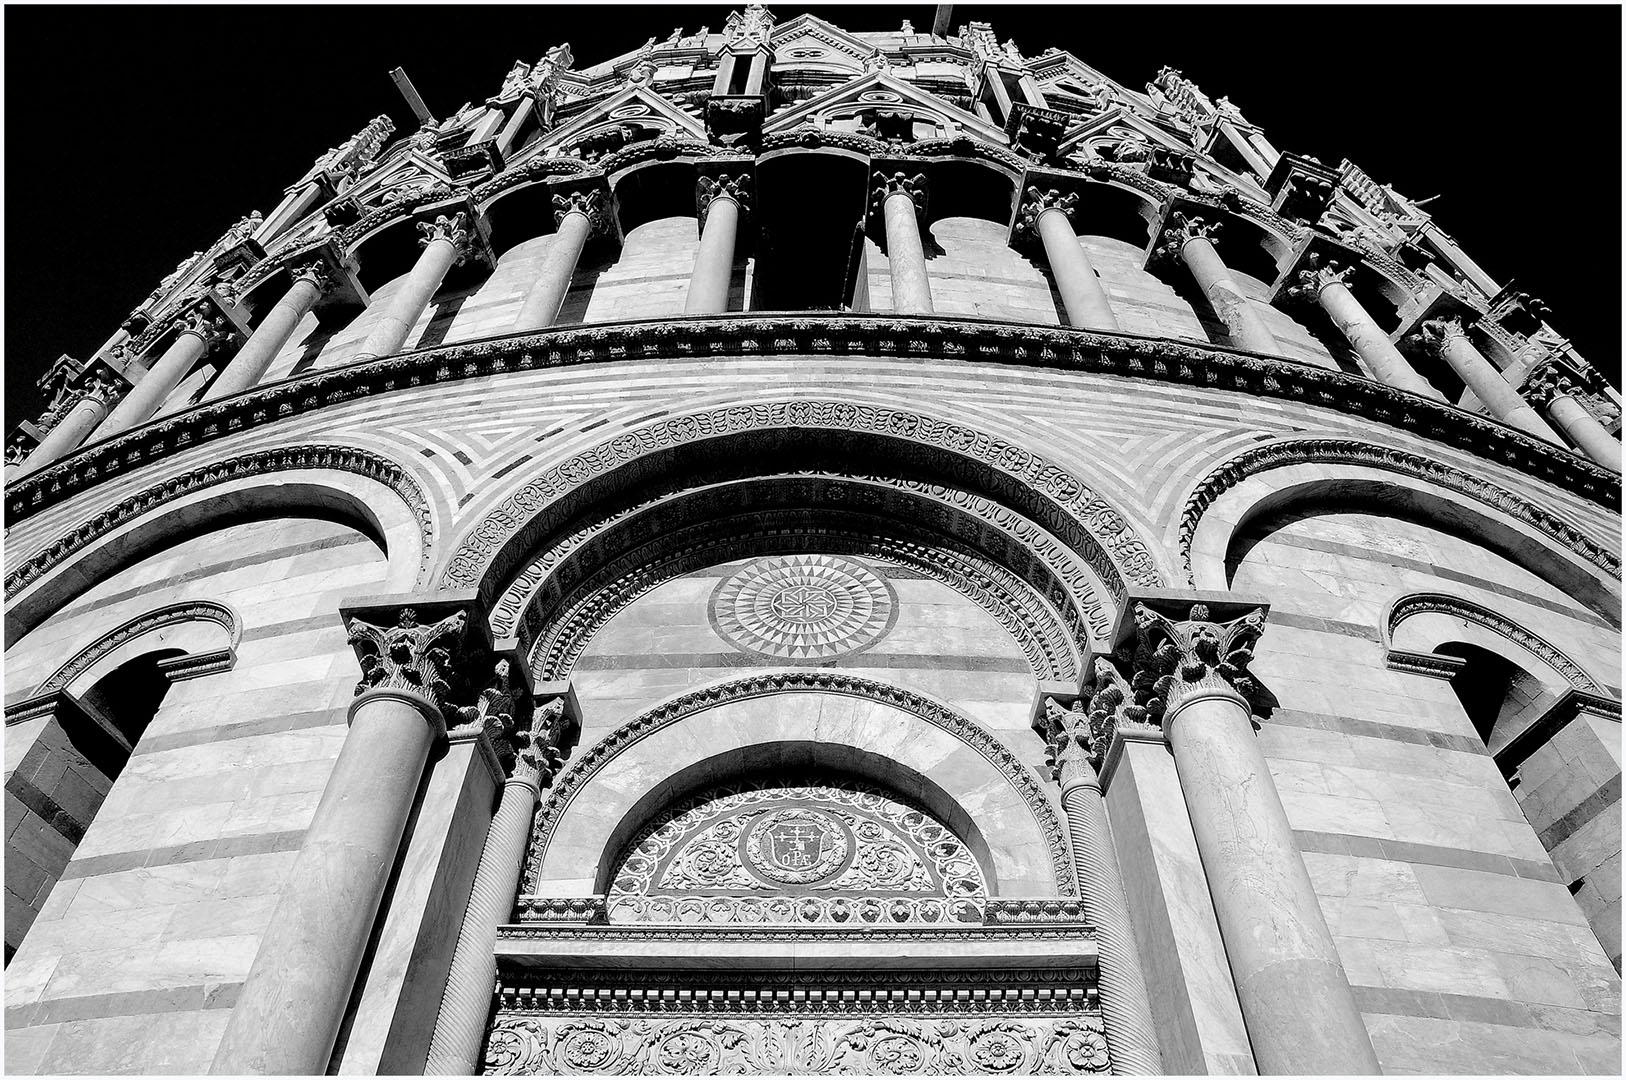 Pisa-Piazza_dei_Miracoli_040_I08-10.39